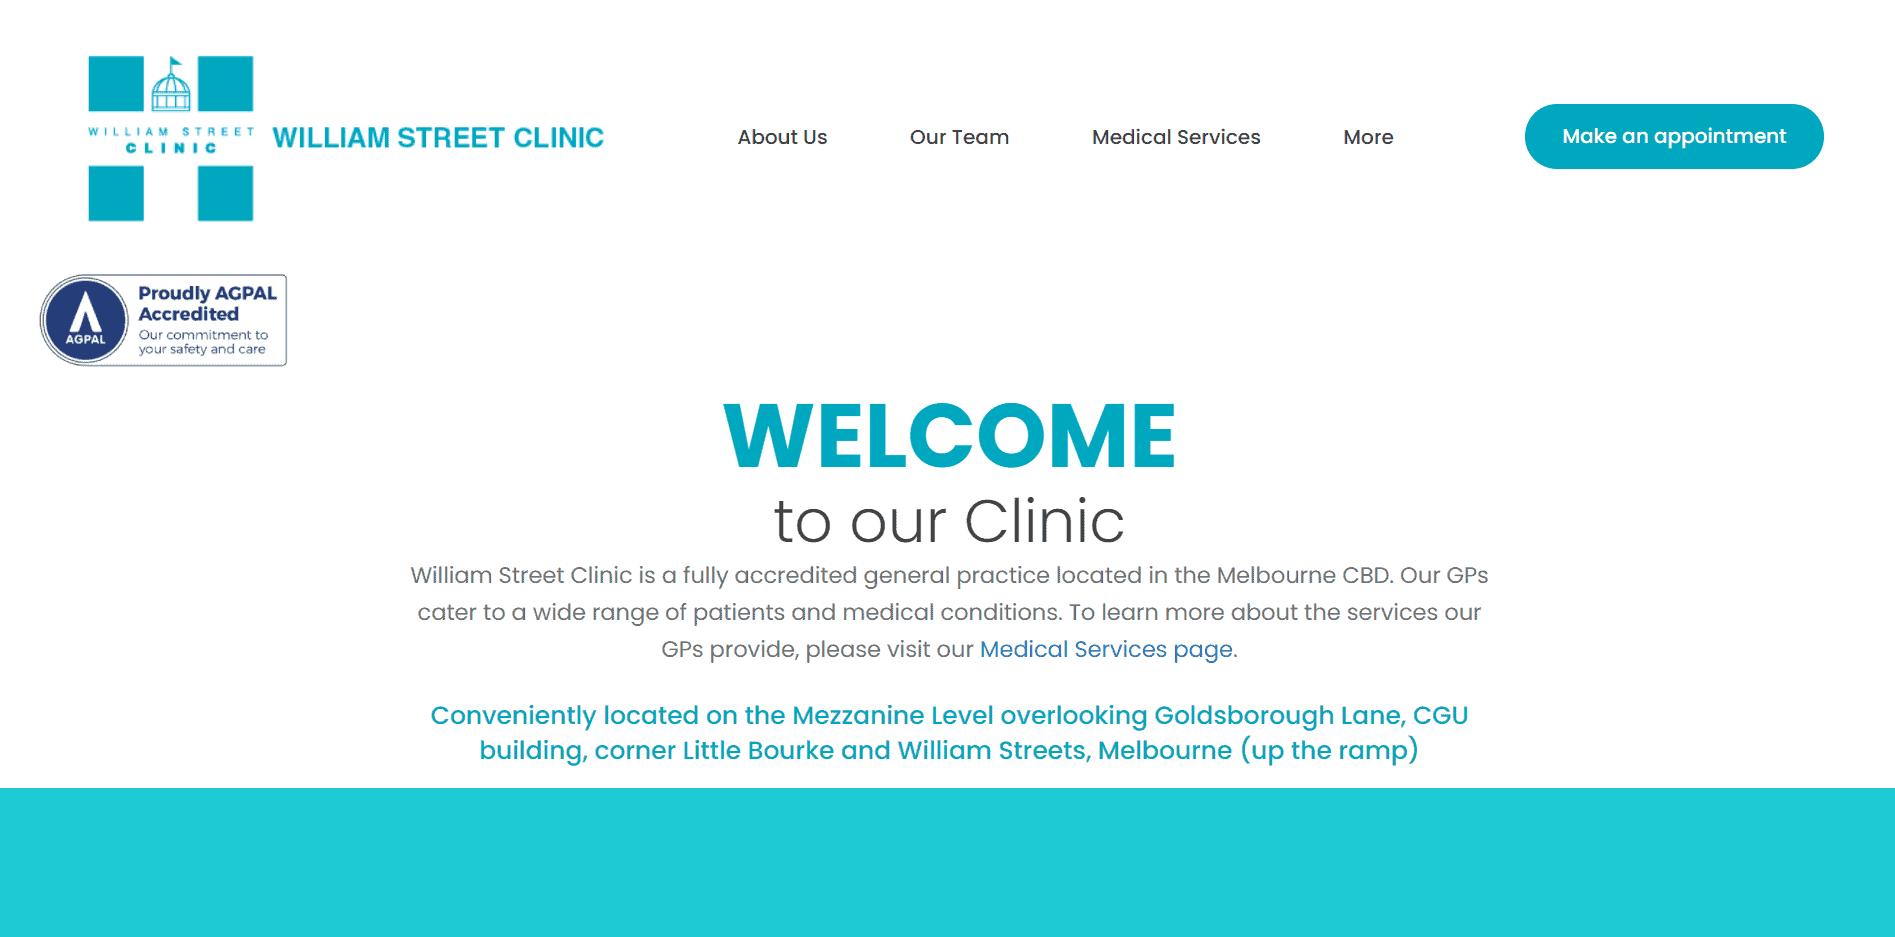 William Street Clinic